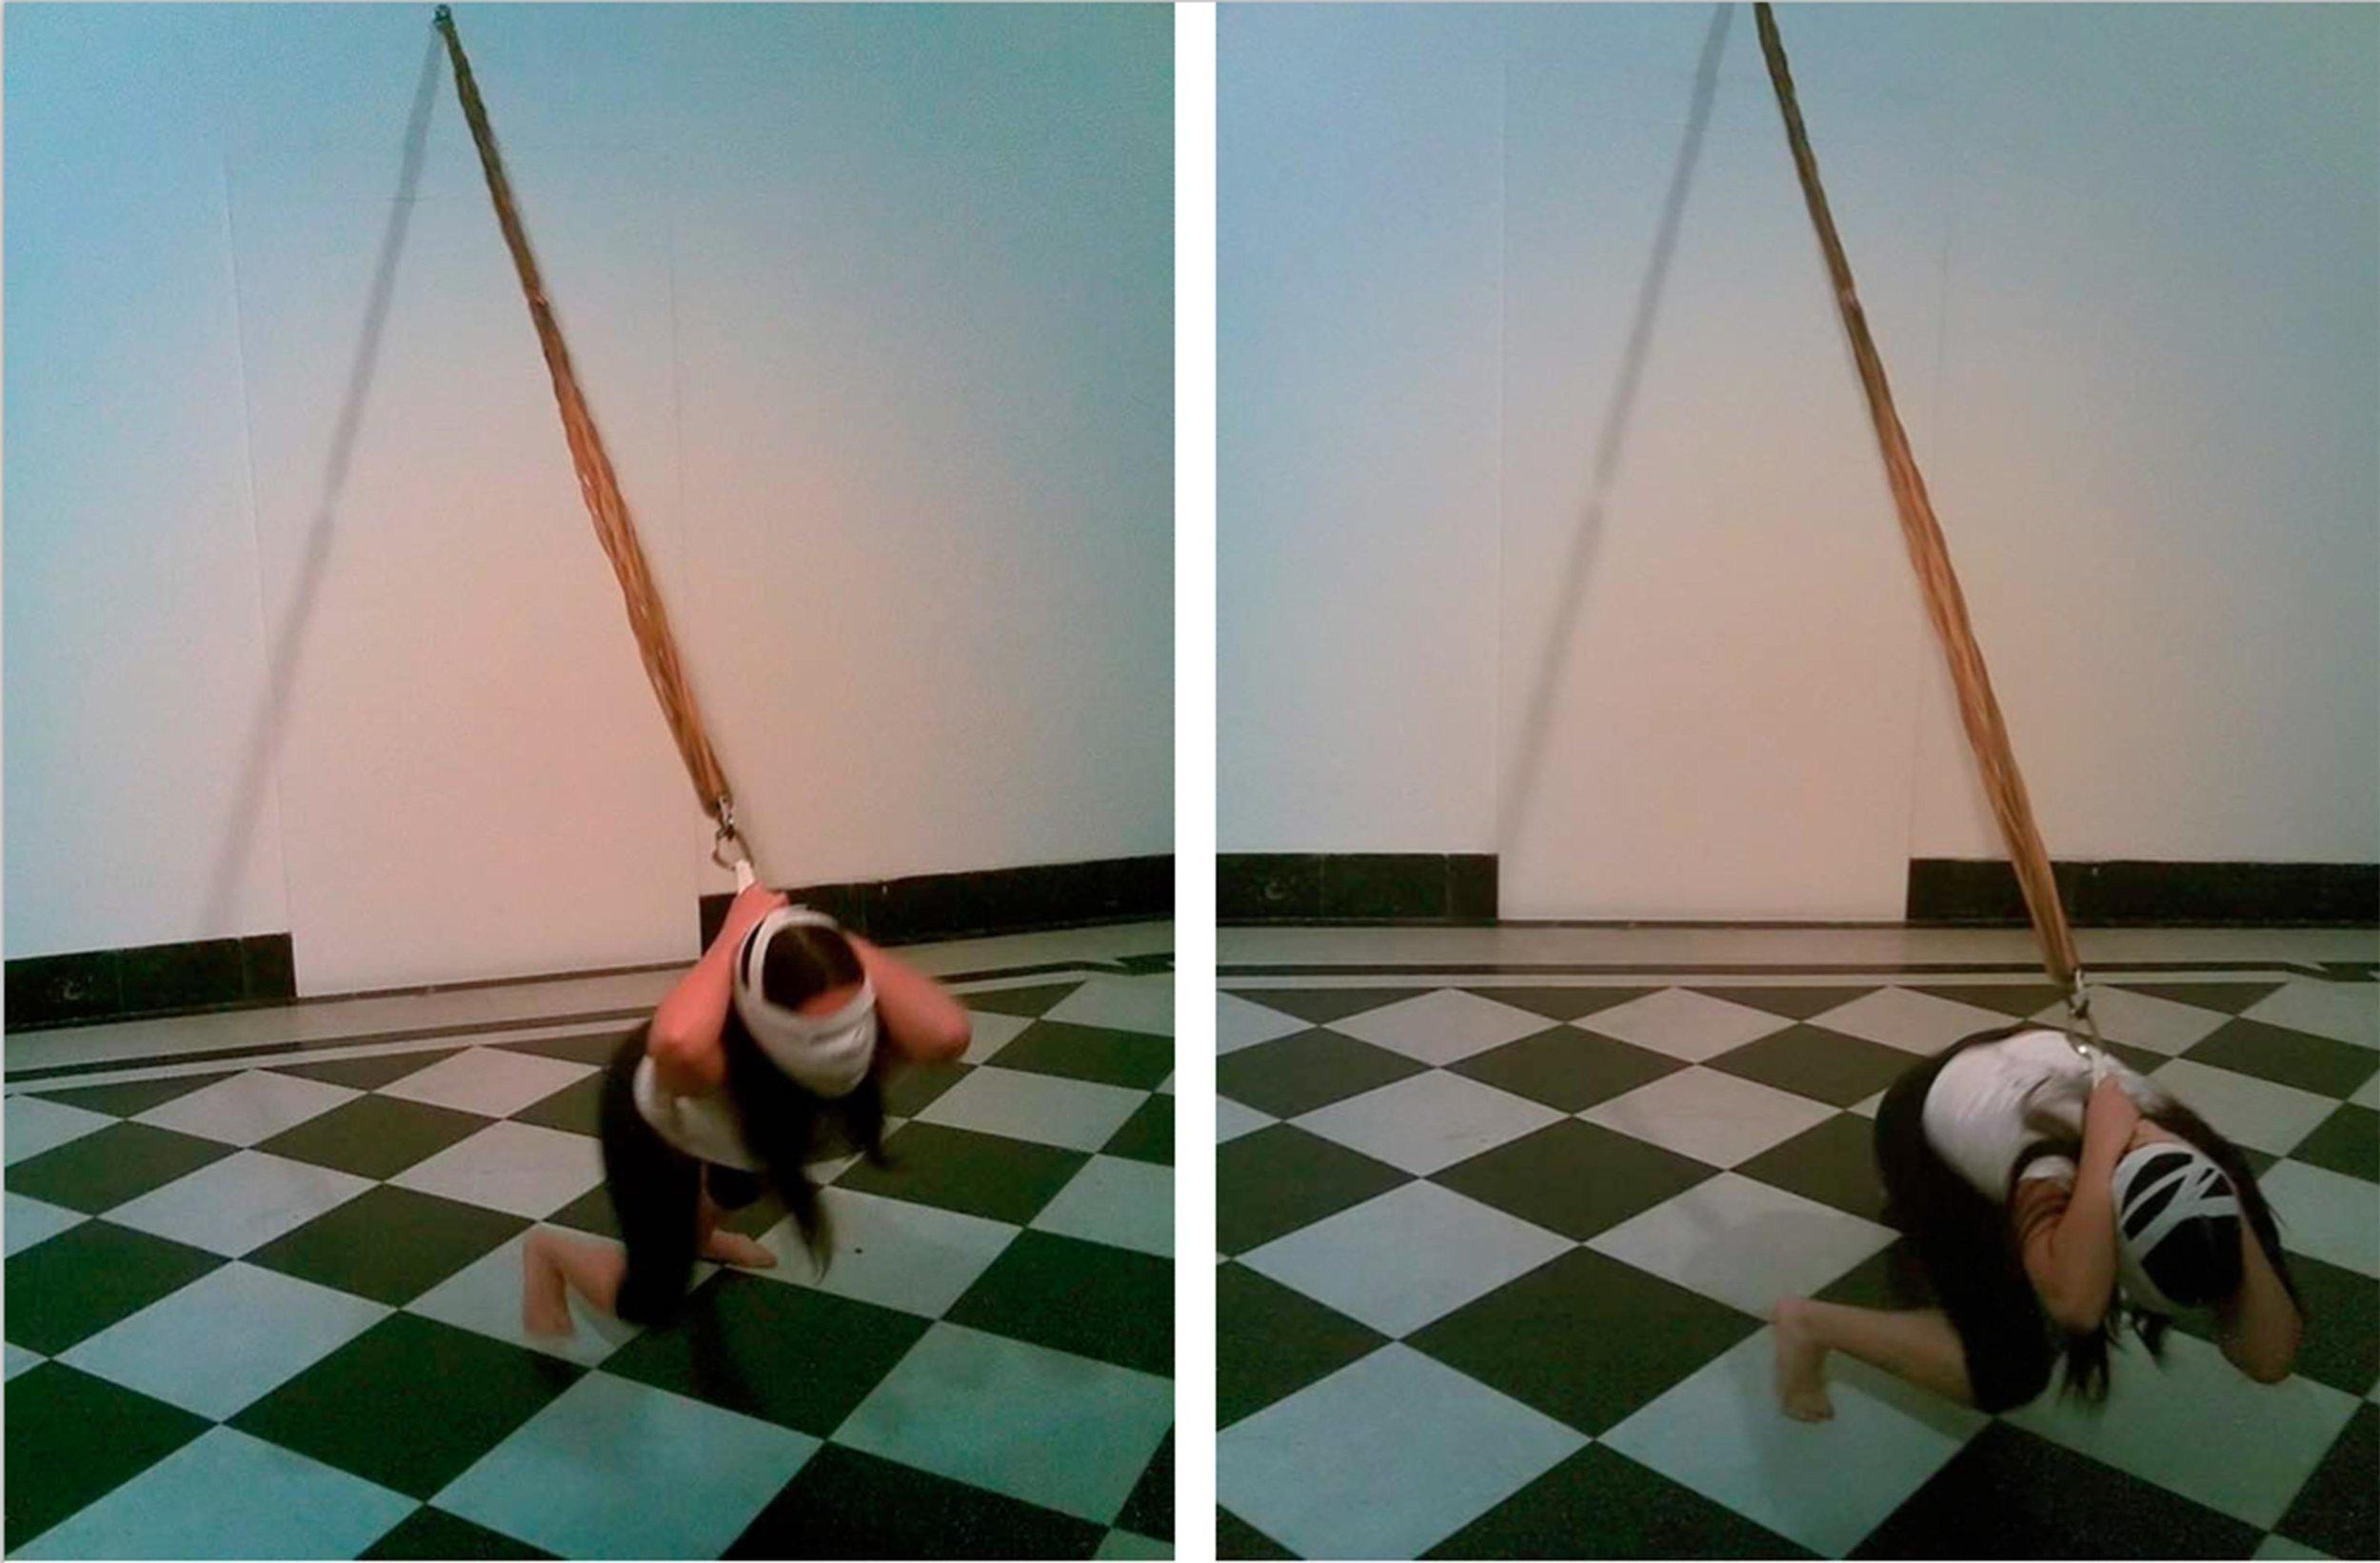 2007 Gabriela Mureb - performance sem título (elásticos) copy.jpg